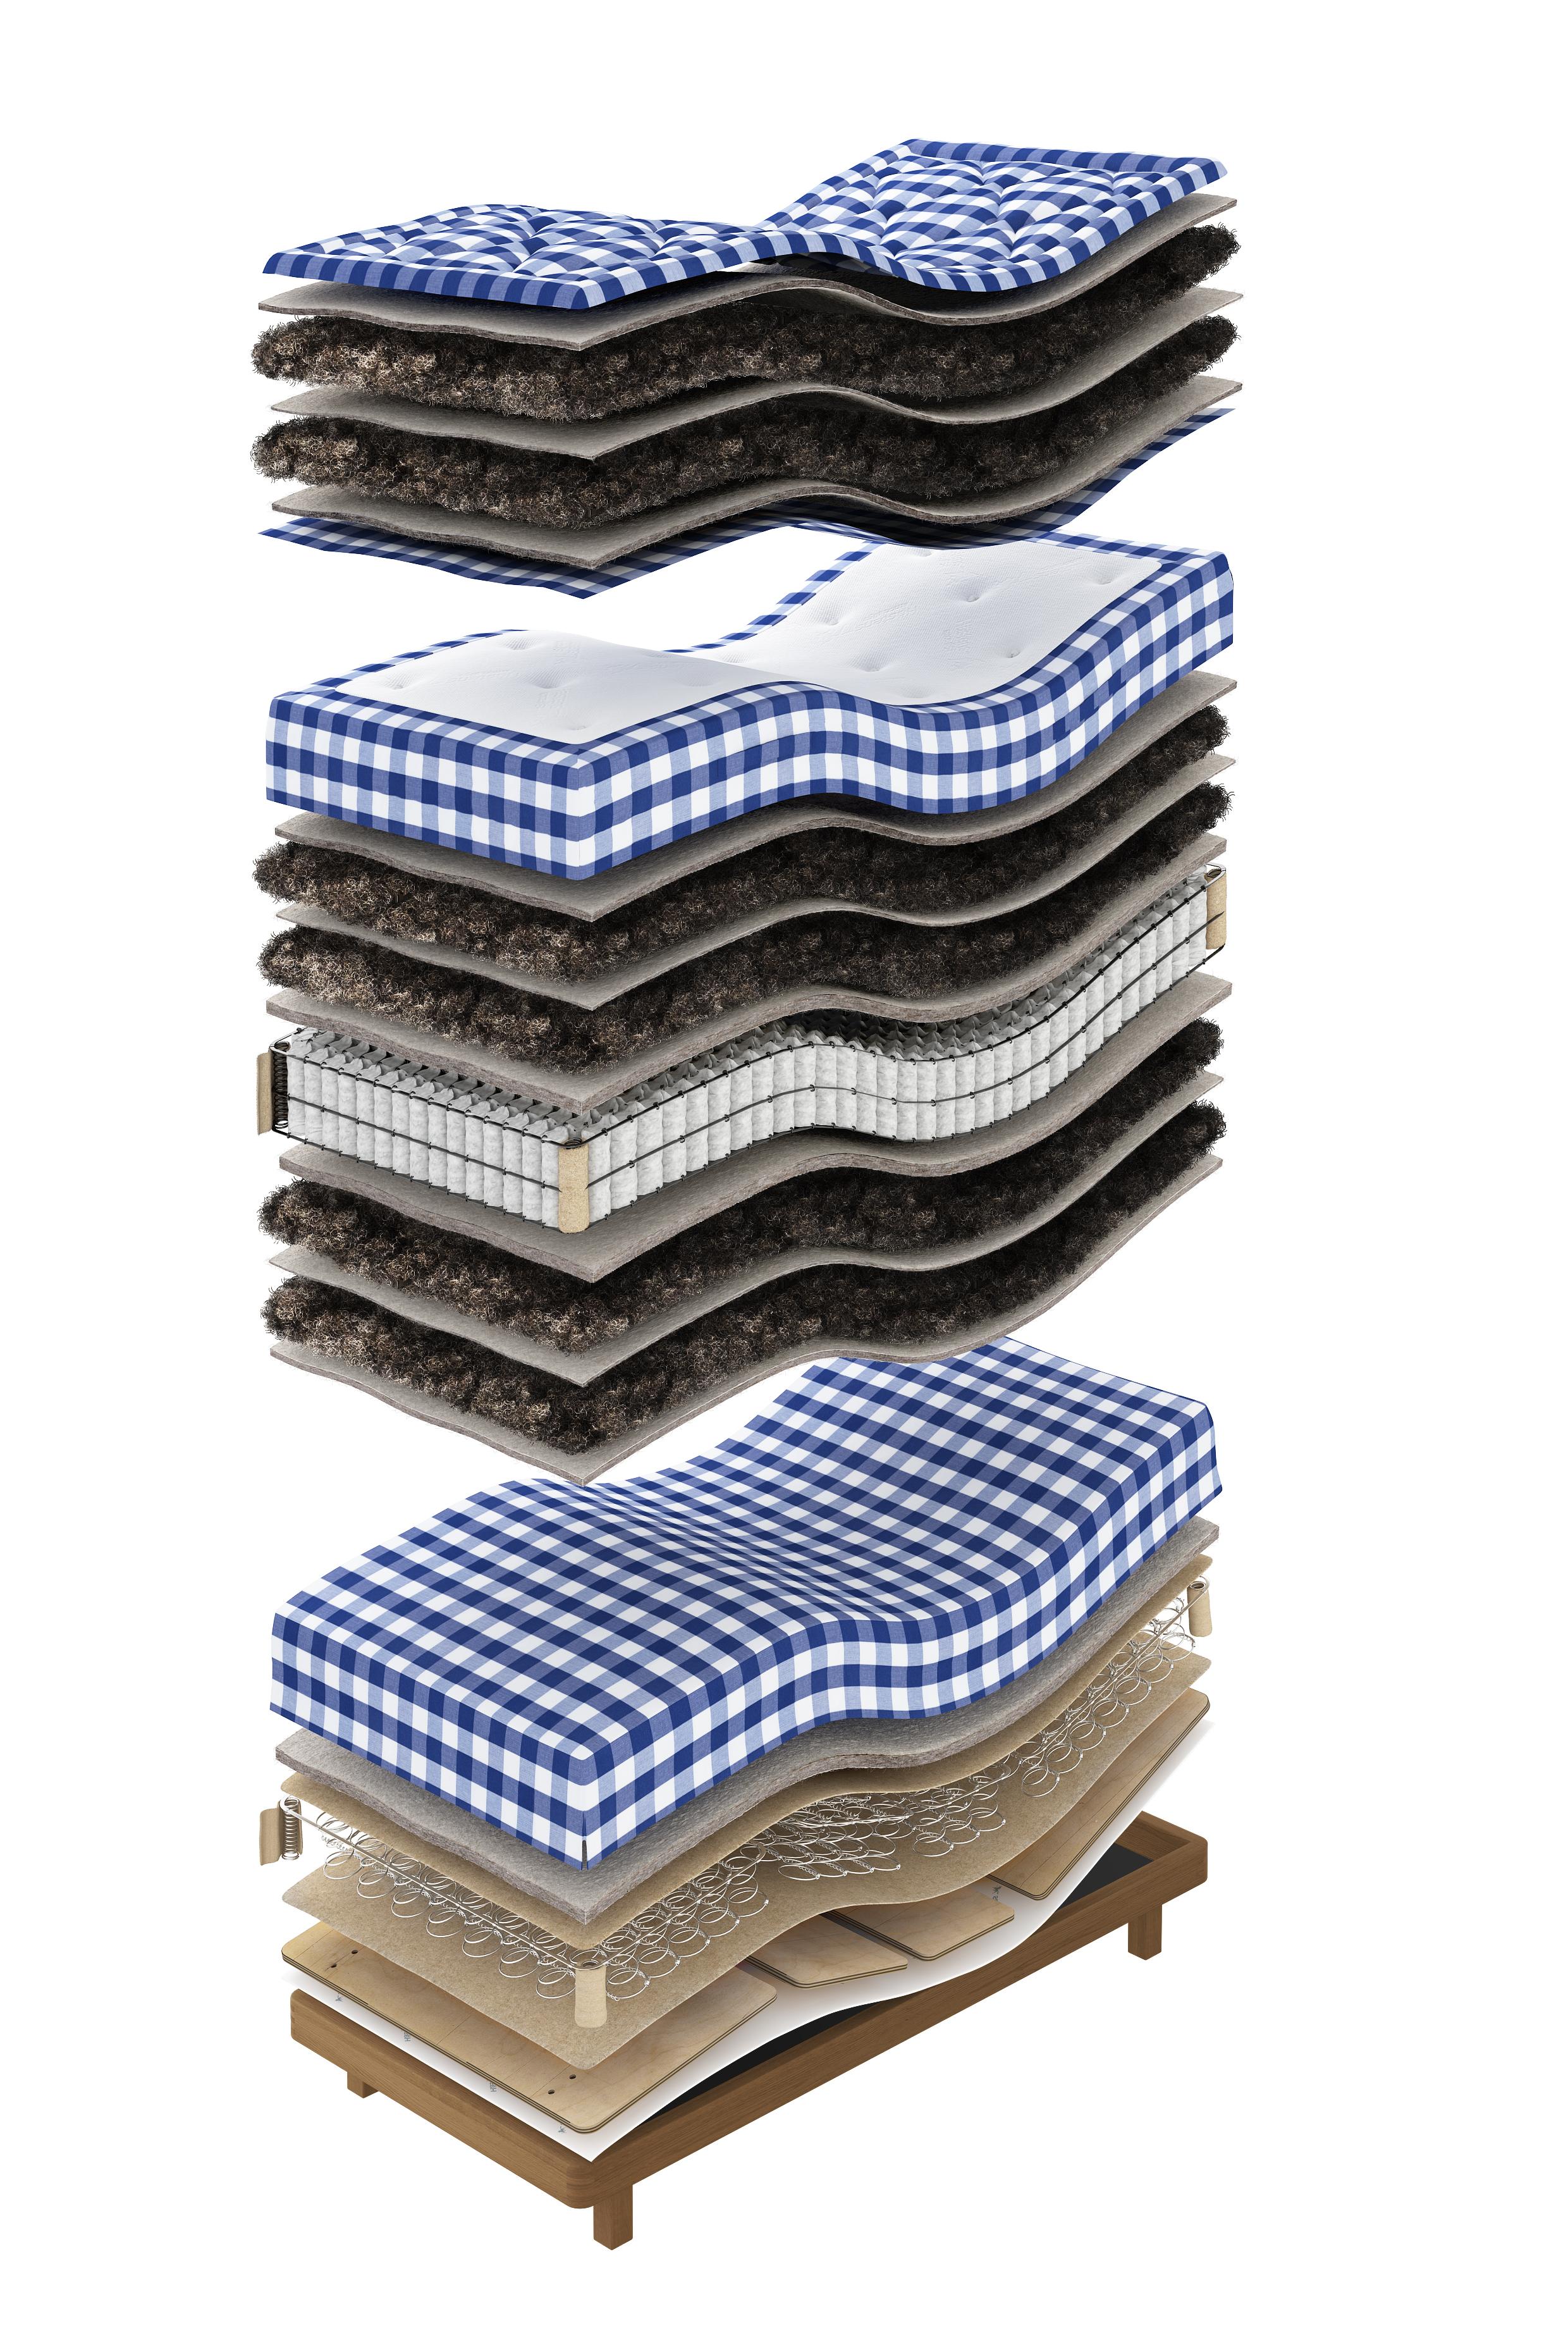 lenoria h stens boxspringbetten h stens. Black Bedroom Furniture Sets. Home Design Ideas